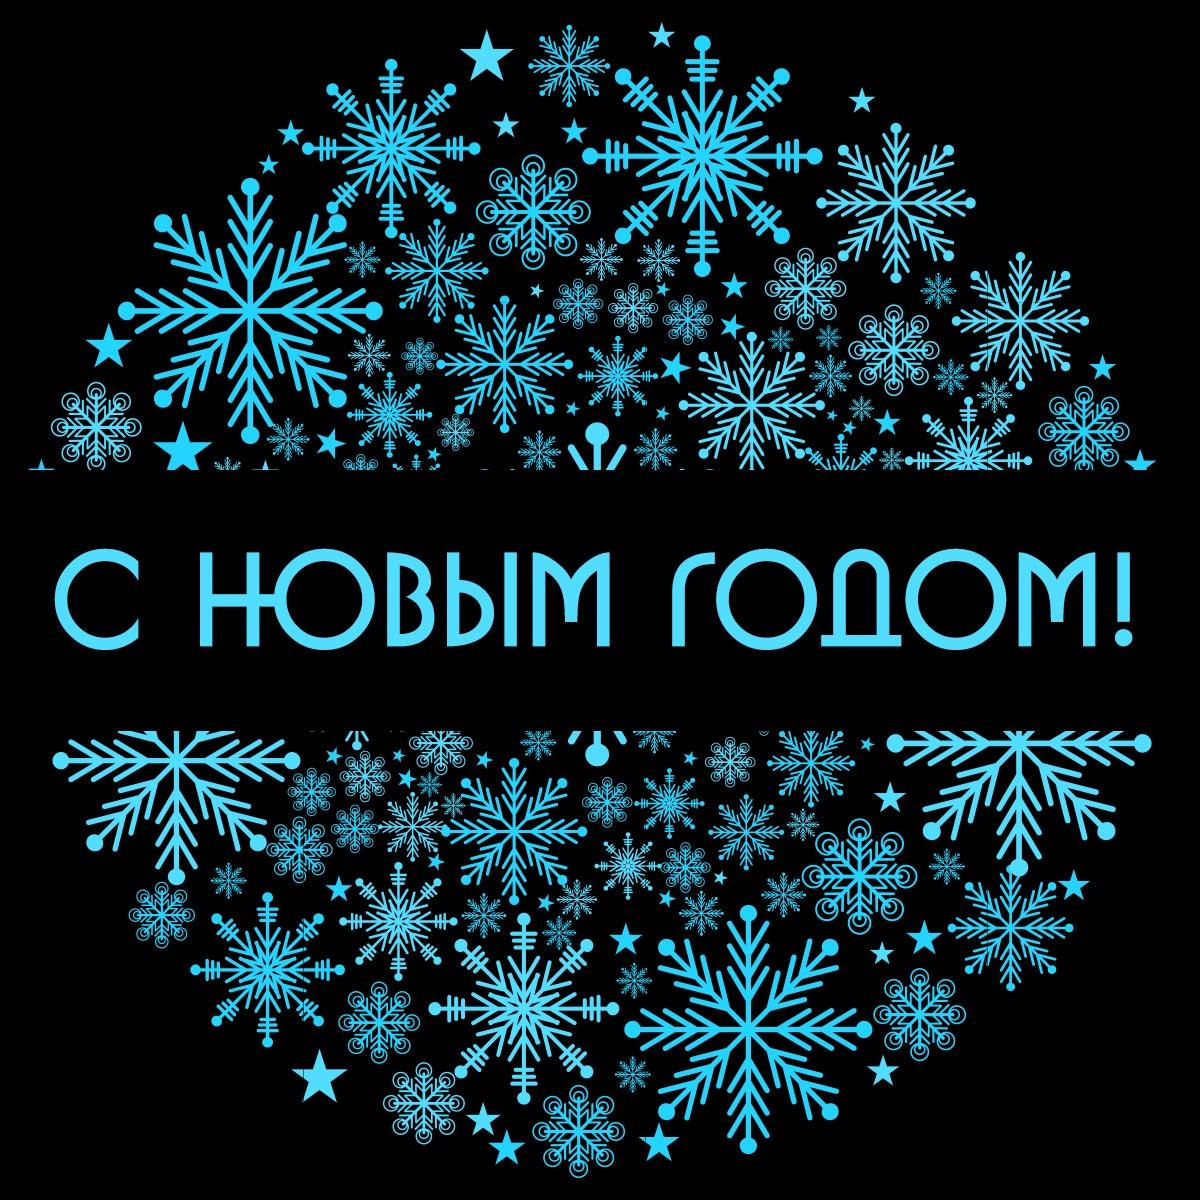 Картинка с текстом и синими снежинками на чёрном фоне.